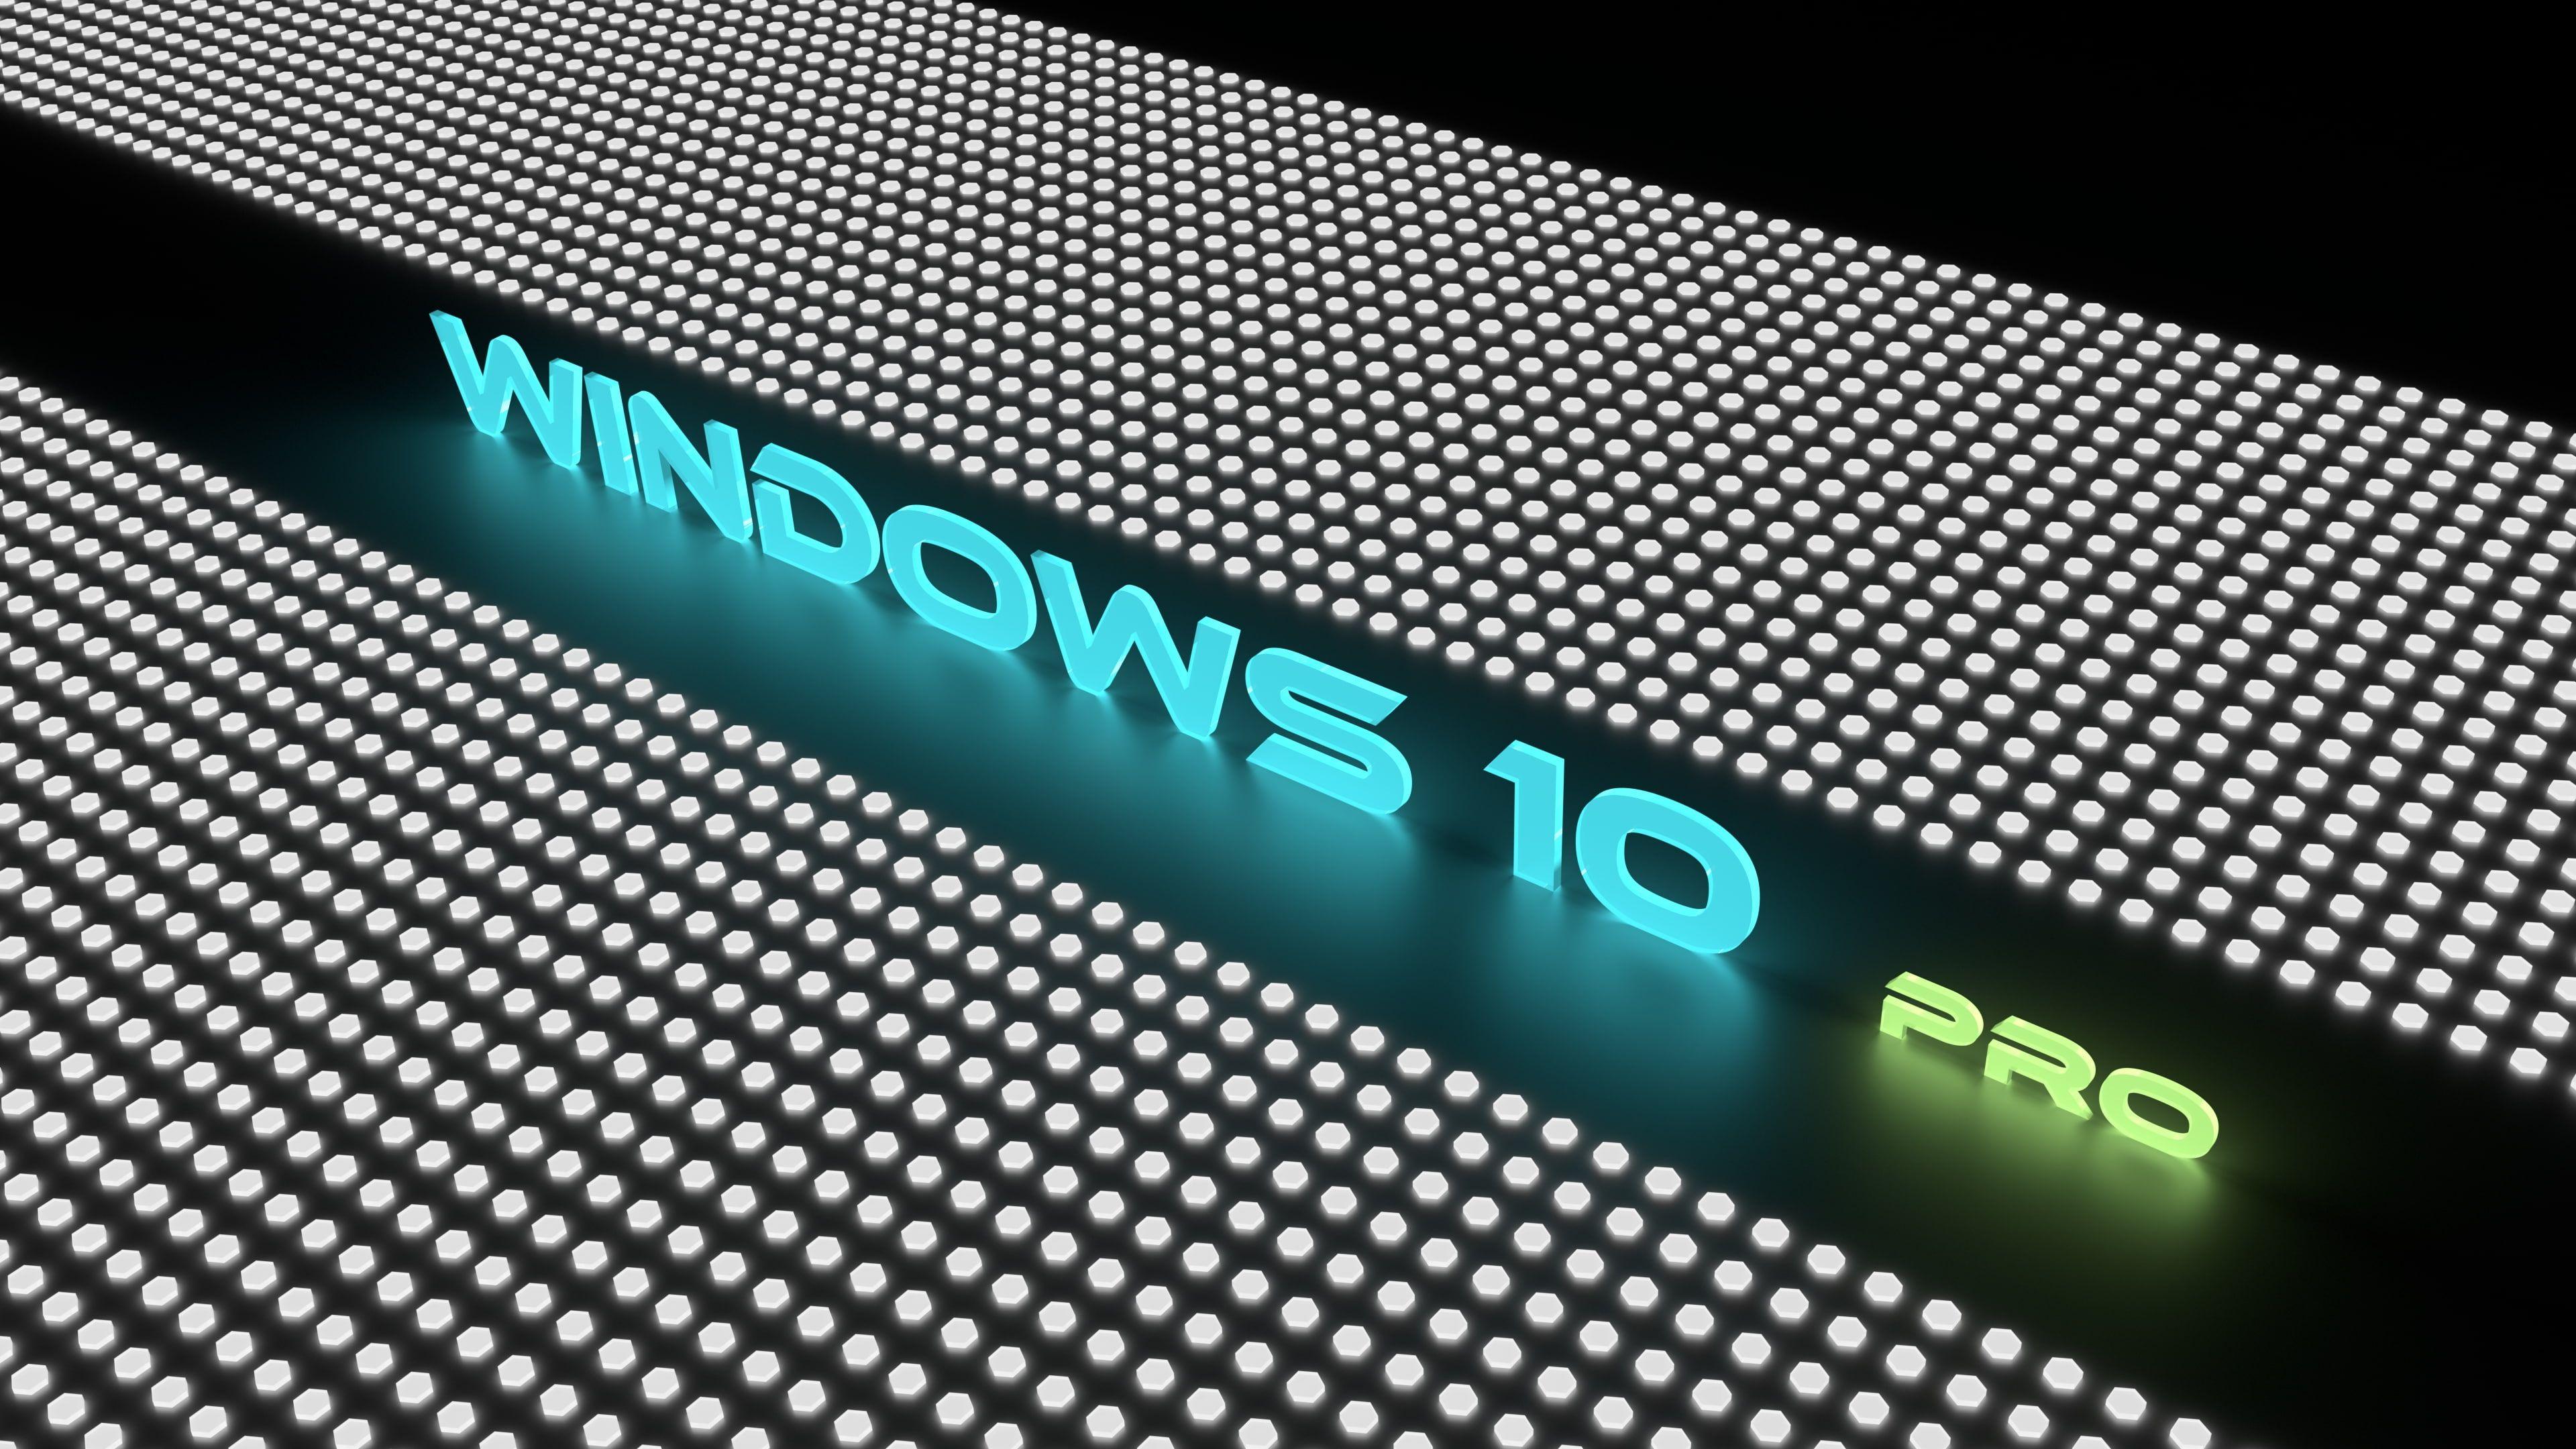 Windows 10 Pro Neon Colors 4k 4k Wallpaper Hdwallpaper Desktop Wallpaper Windows 10 Windows 10 Samsung Wallpaper